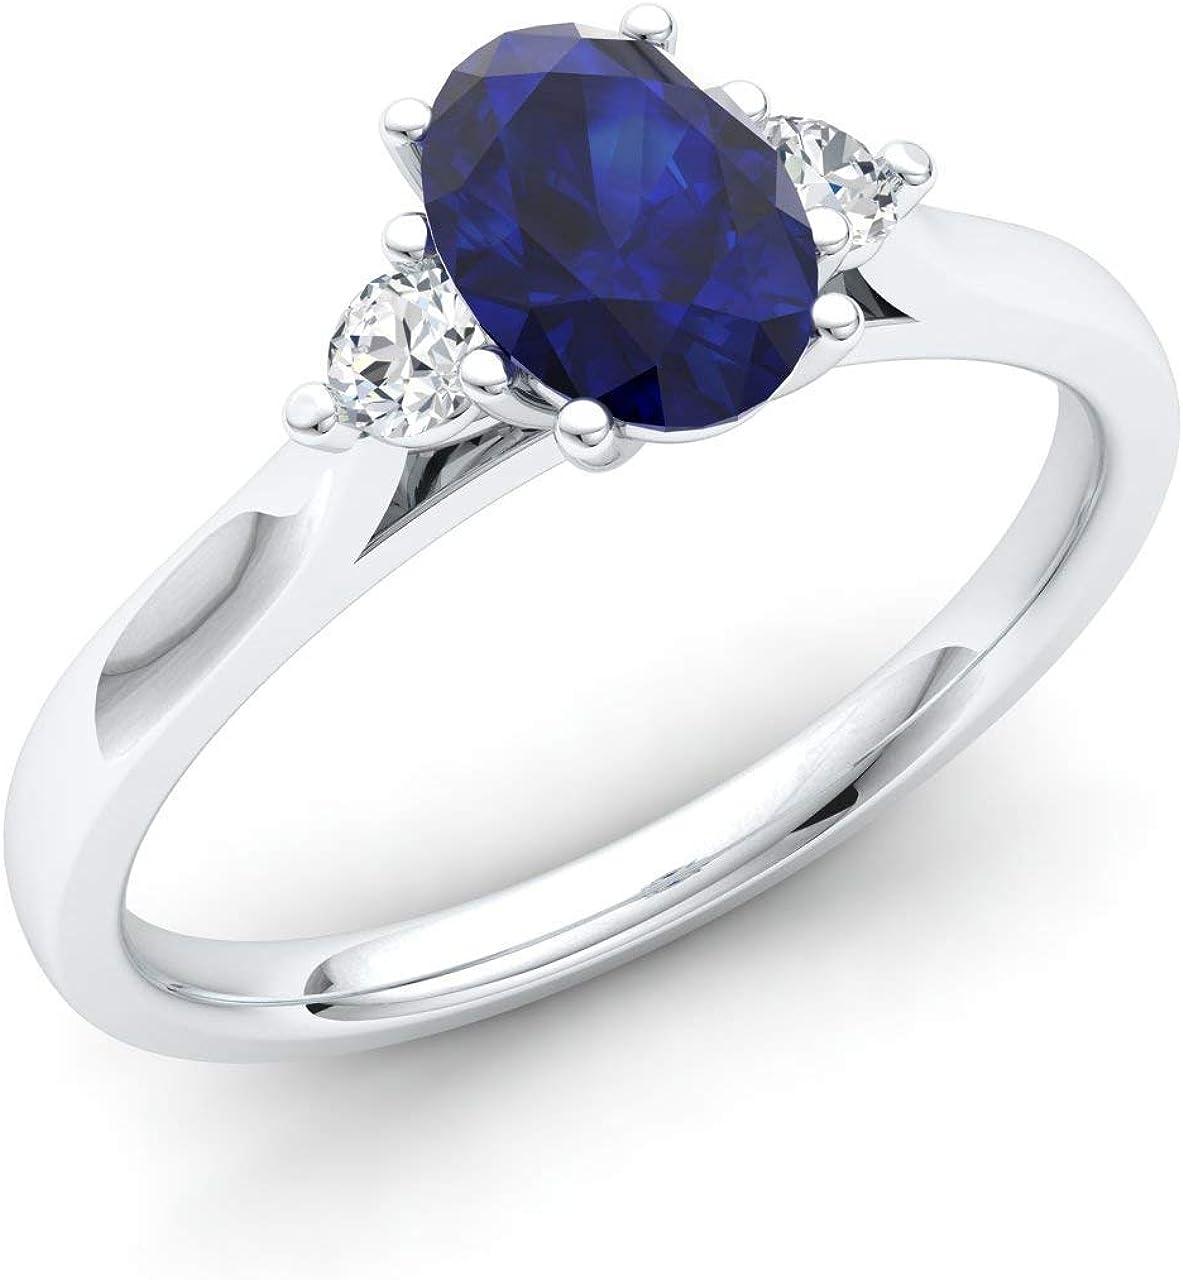 Diamondere Fresno Mall Free Shipping New Natural and Certified Oval Diamond Gemstone Cut E